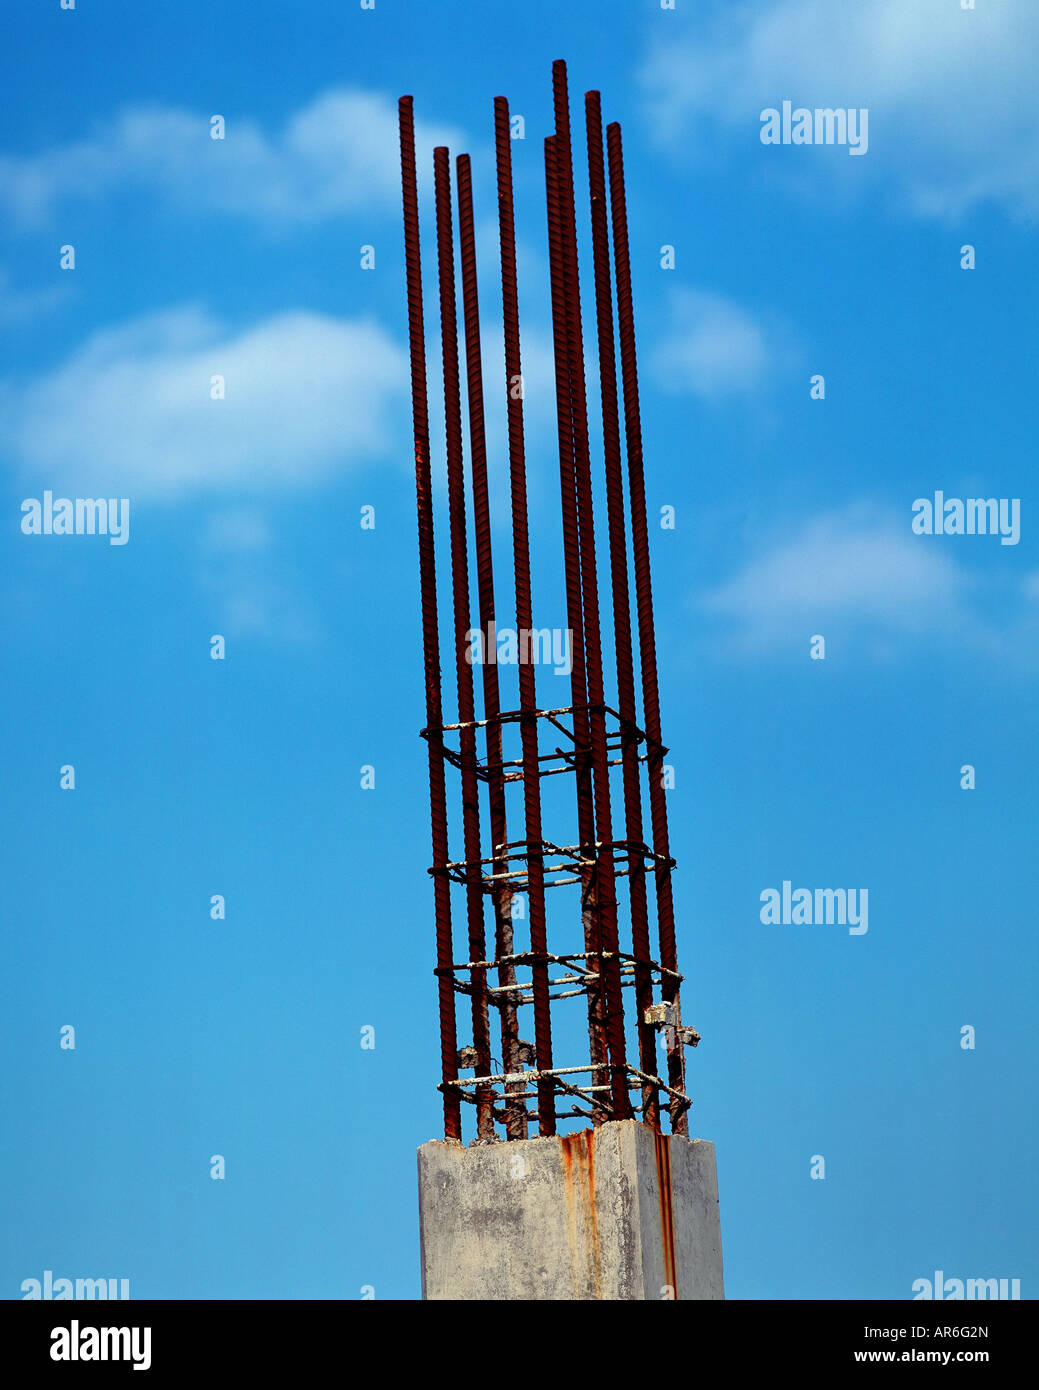 Rusting metal rods - Stock Image